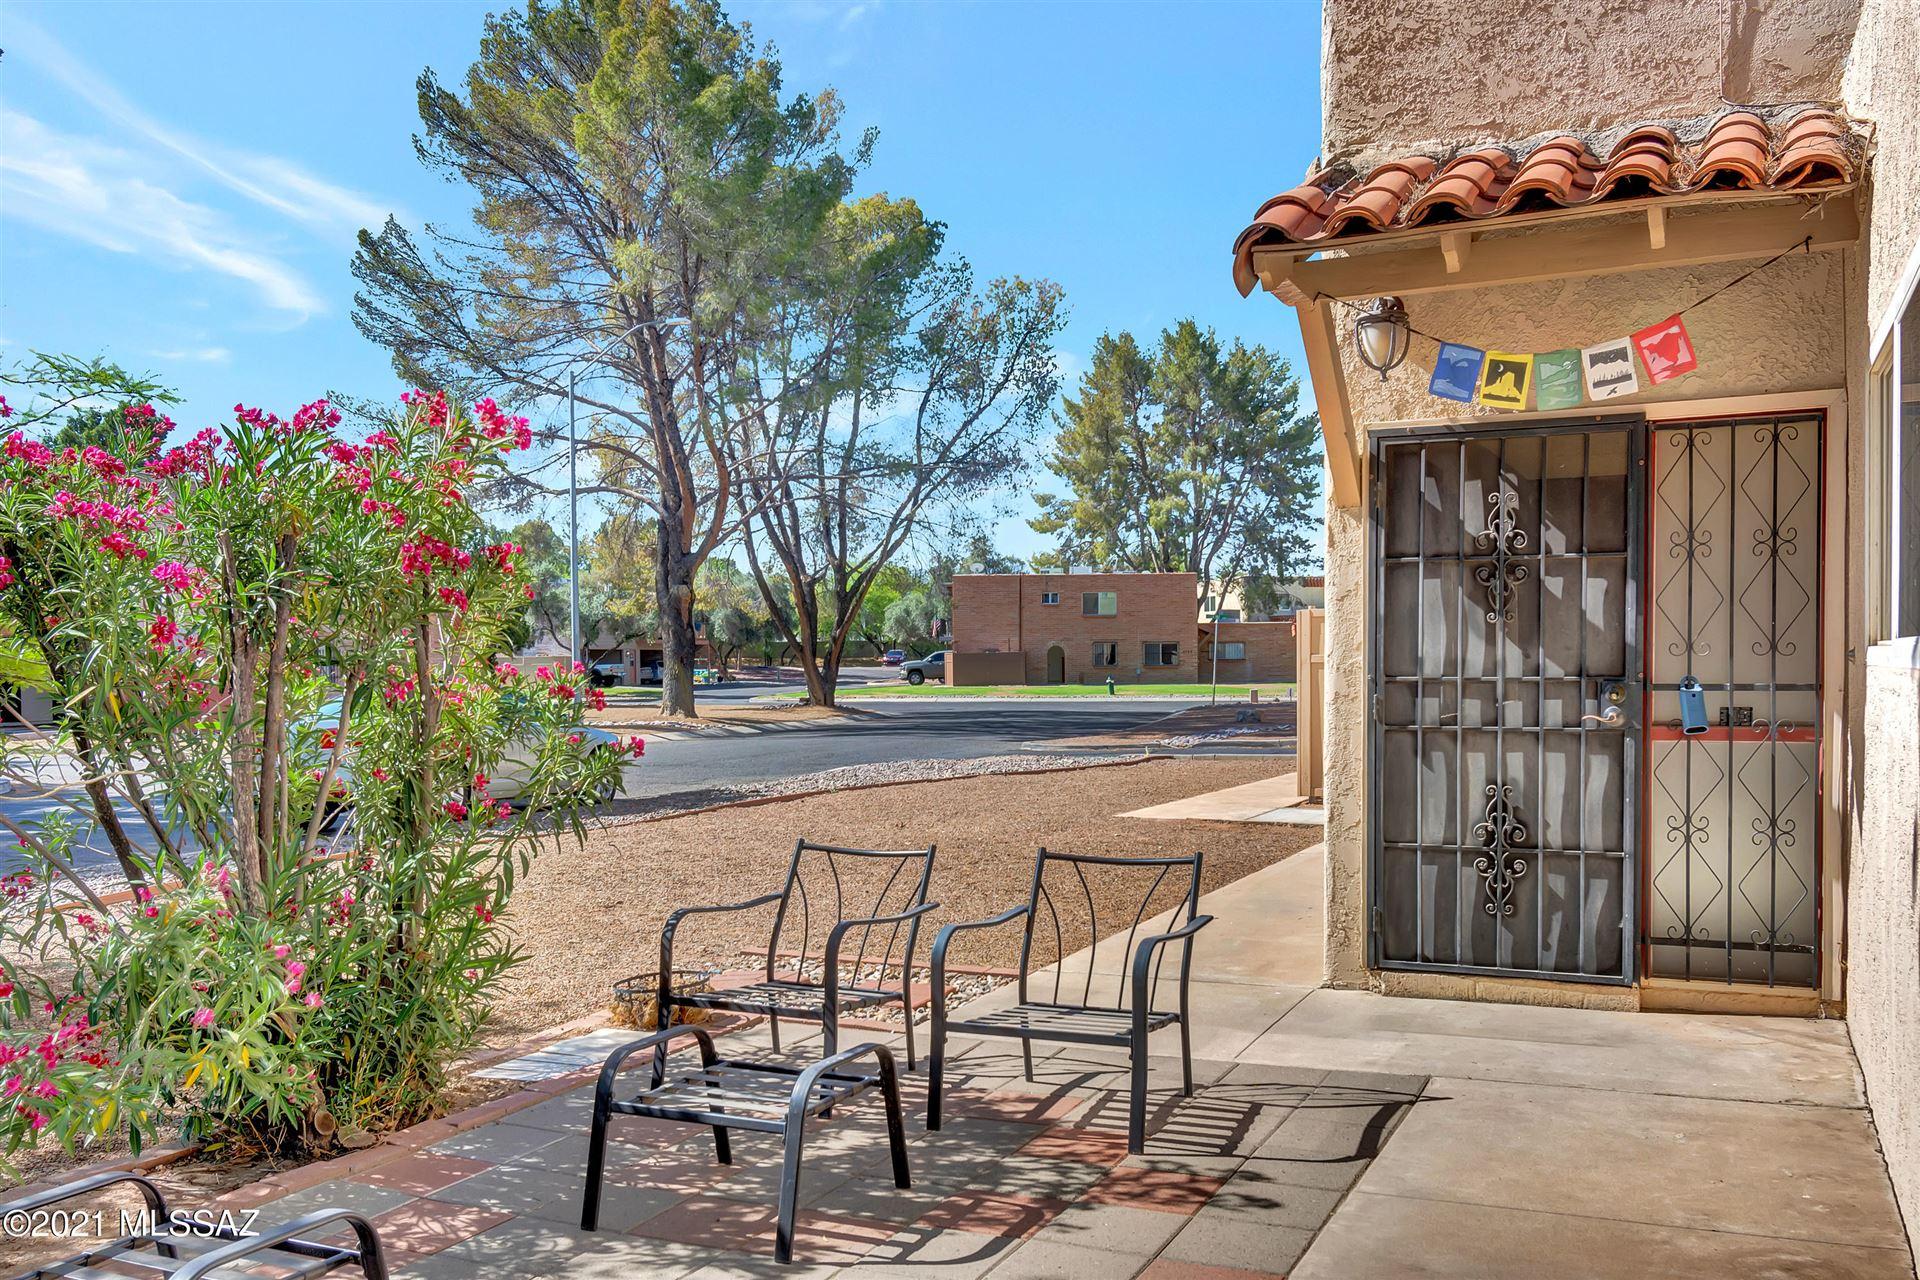 6601 E Calle Alegria #Unit B, Tucson, AZ 85715 - #: 22112125